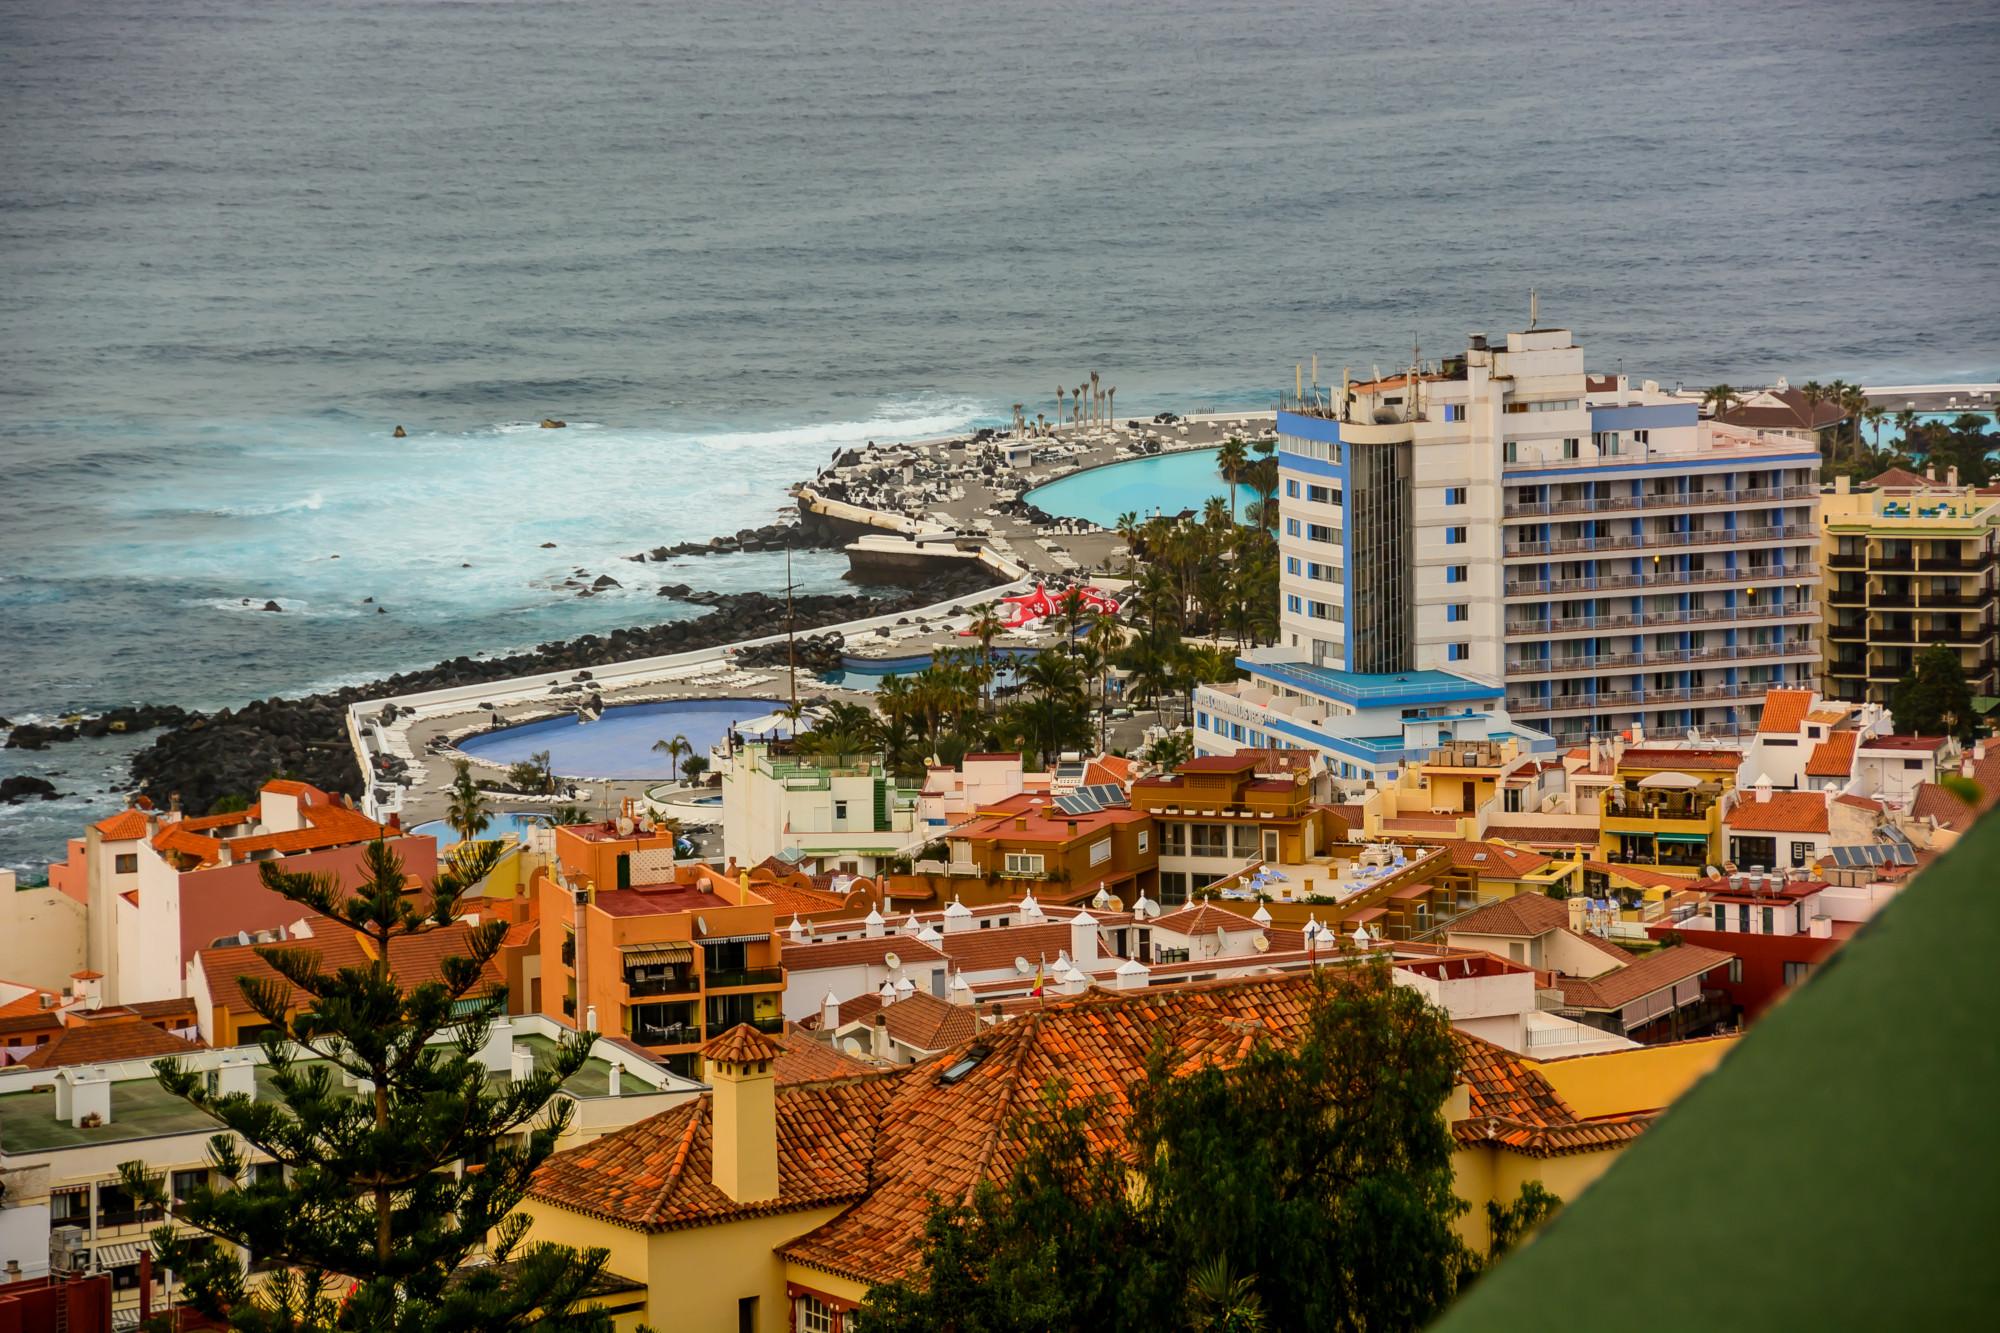 Puerto-de-la-cruz-Tenerife